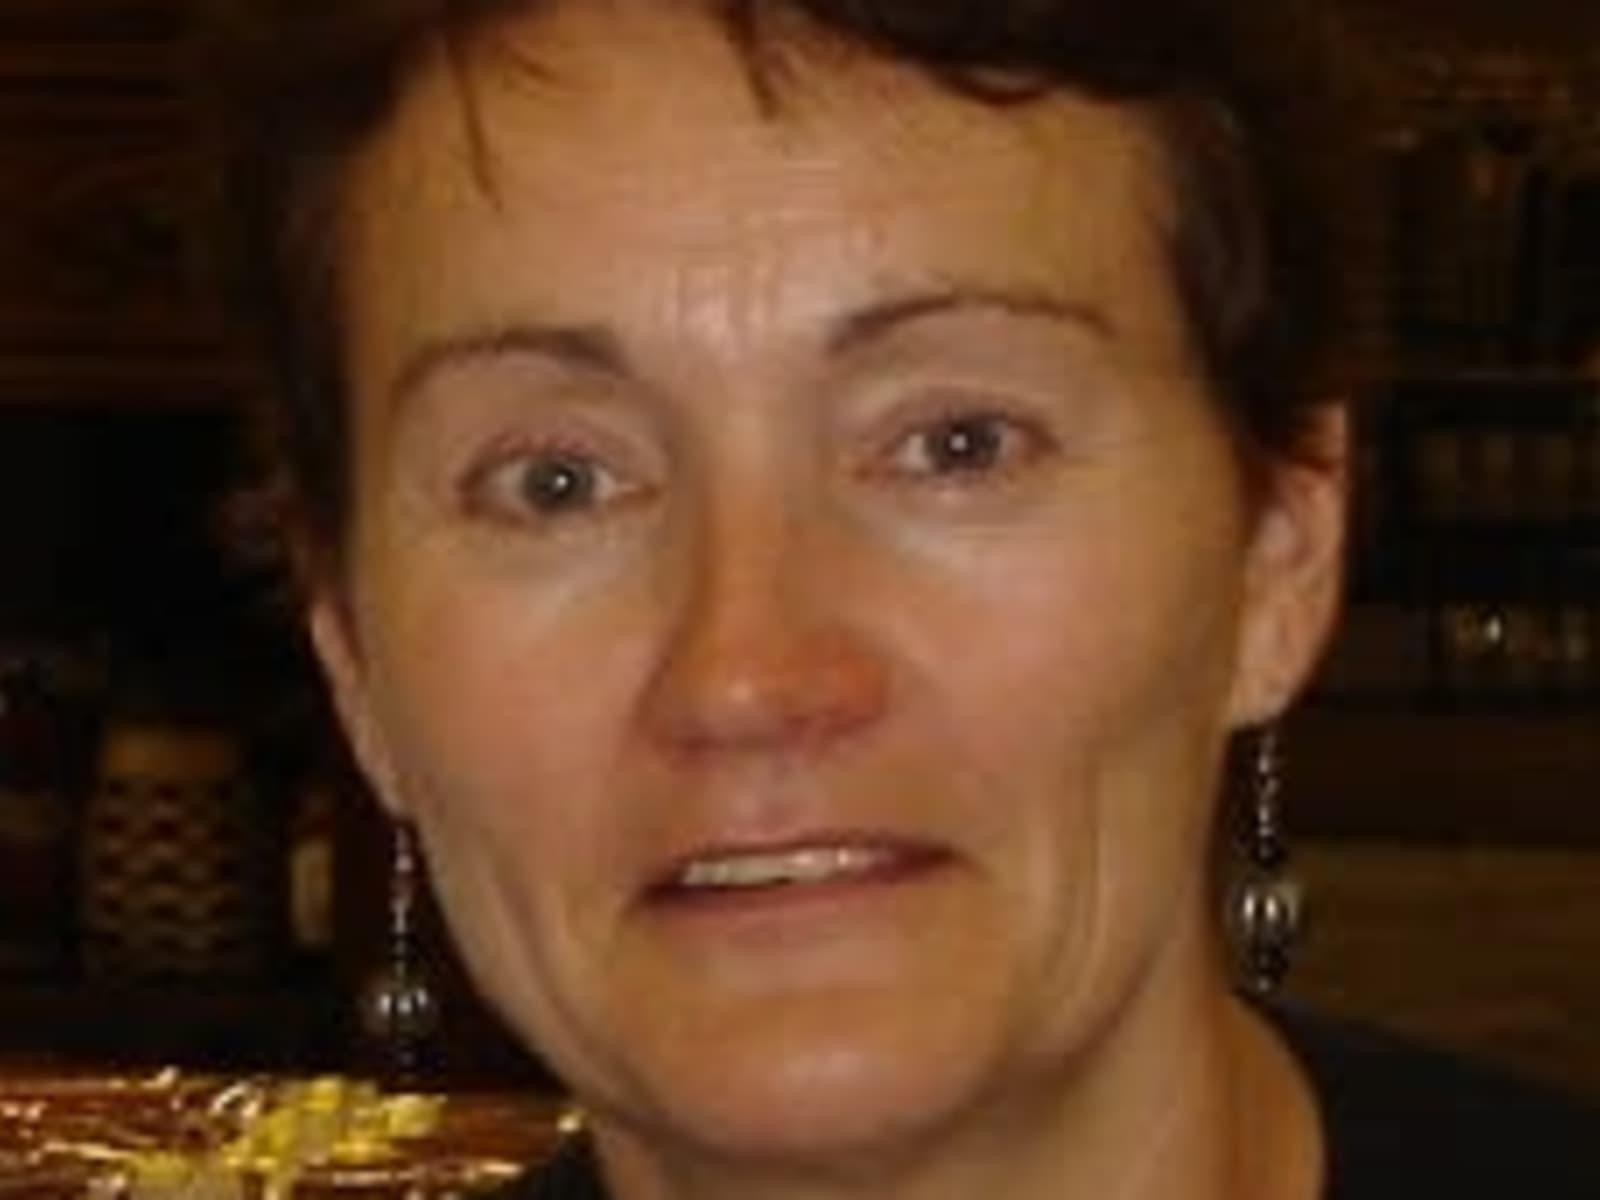 Teresa from Perth, Western Australia, Australia